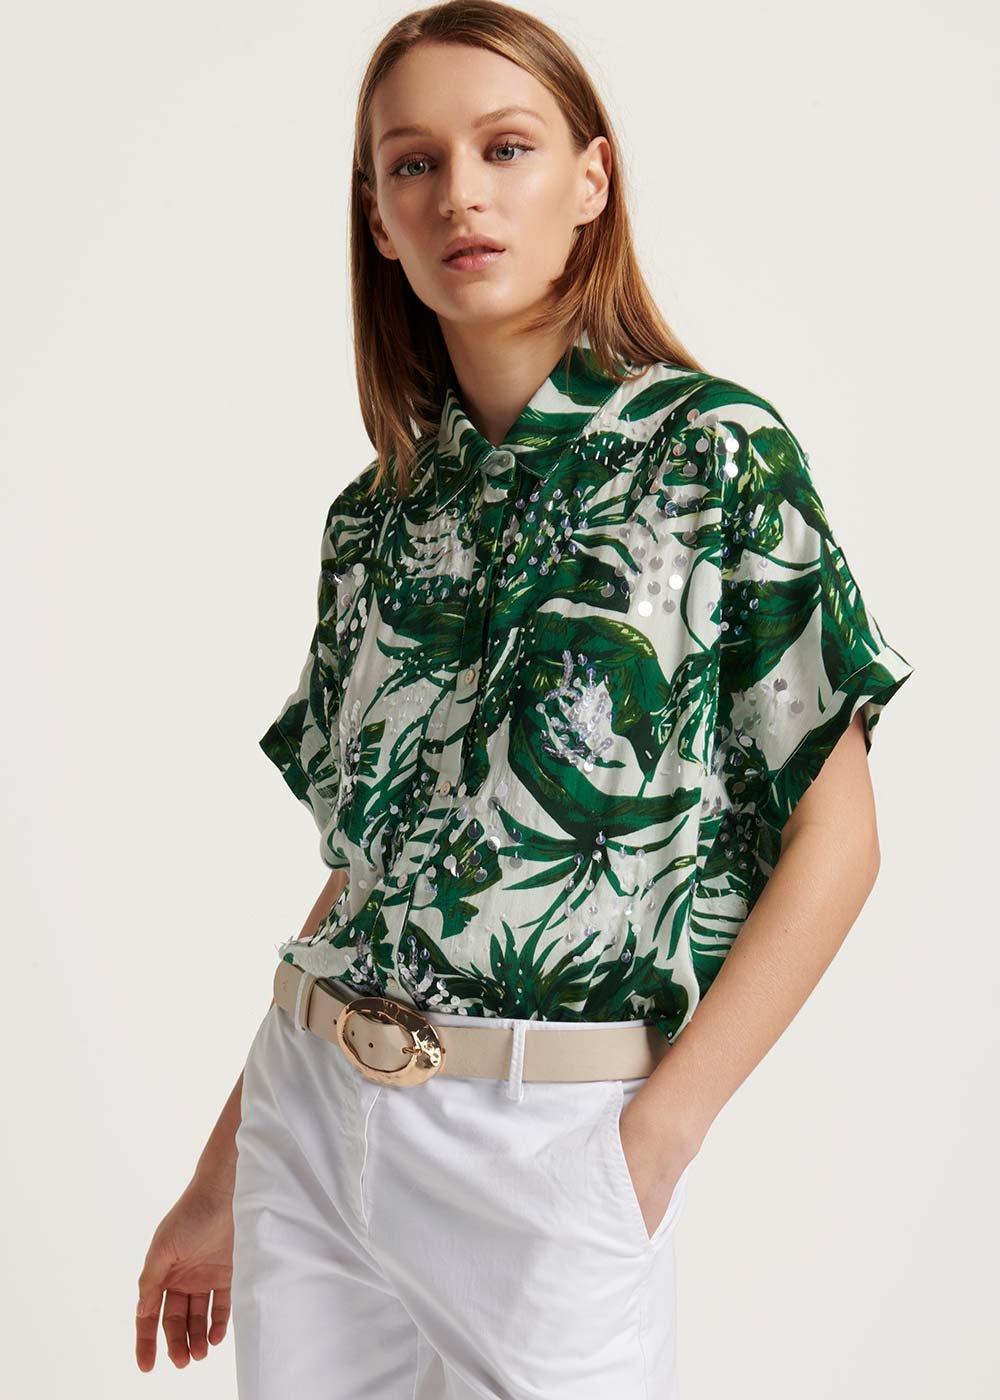 Cashy patterned shirt - White \ Menta \ Fantasia - Woman